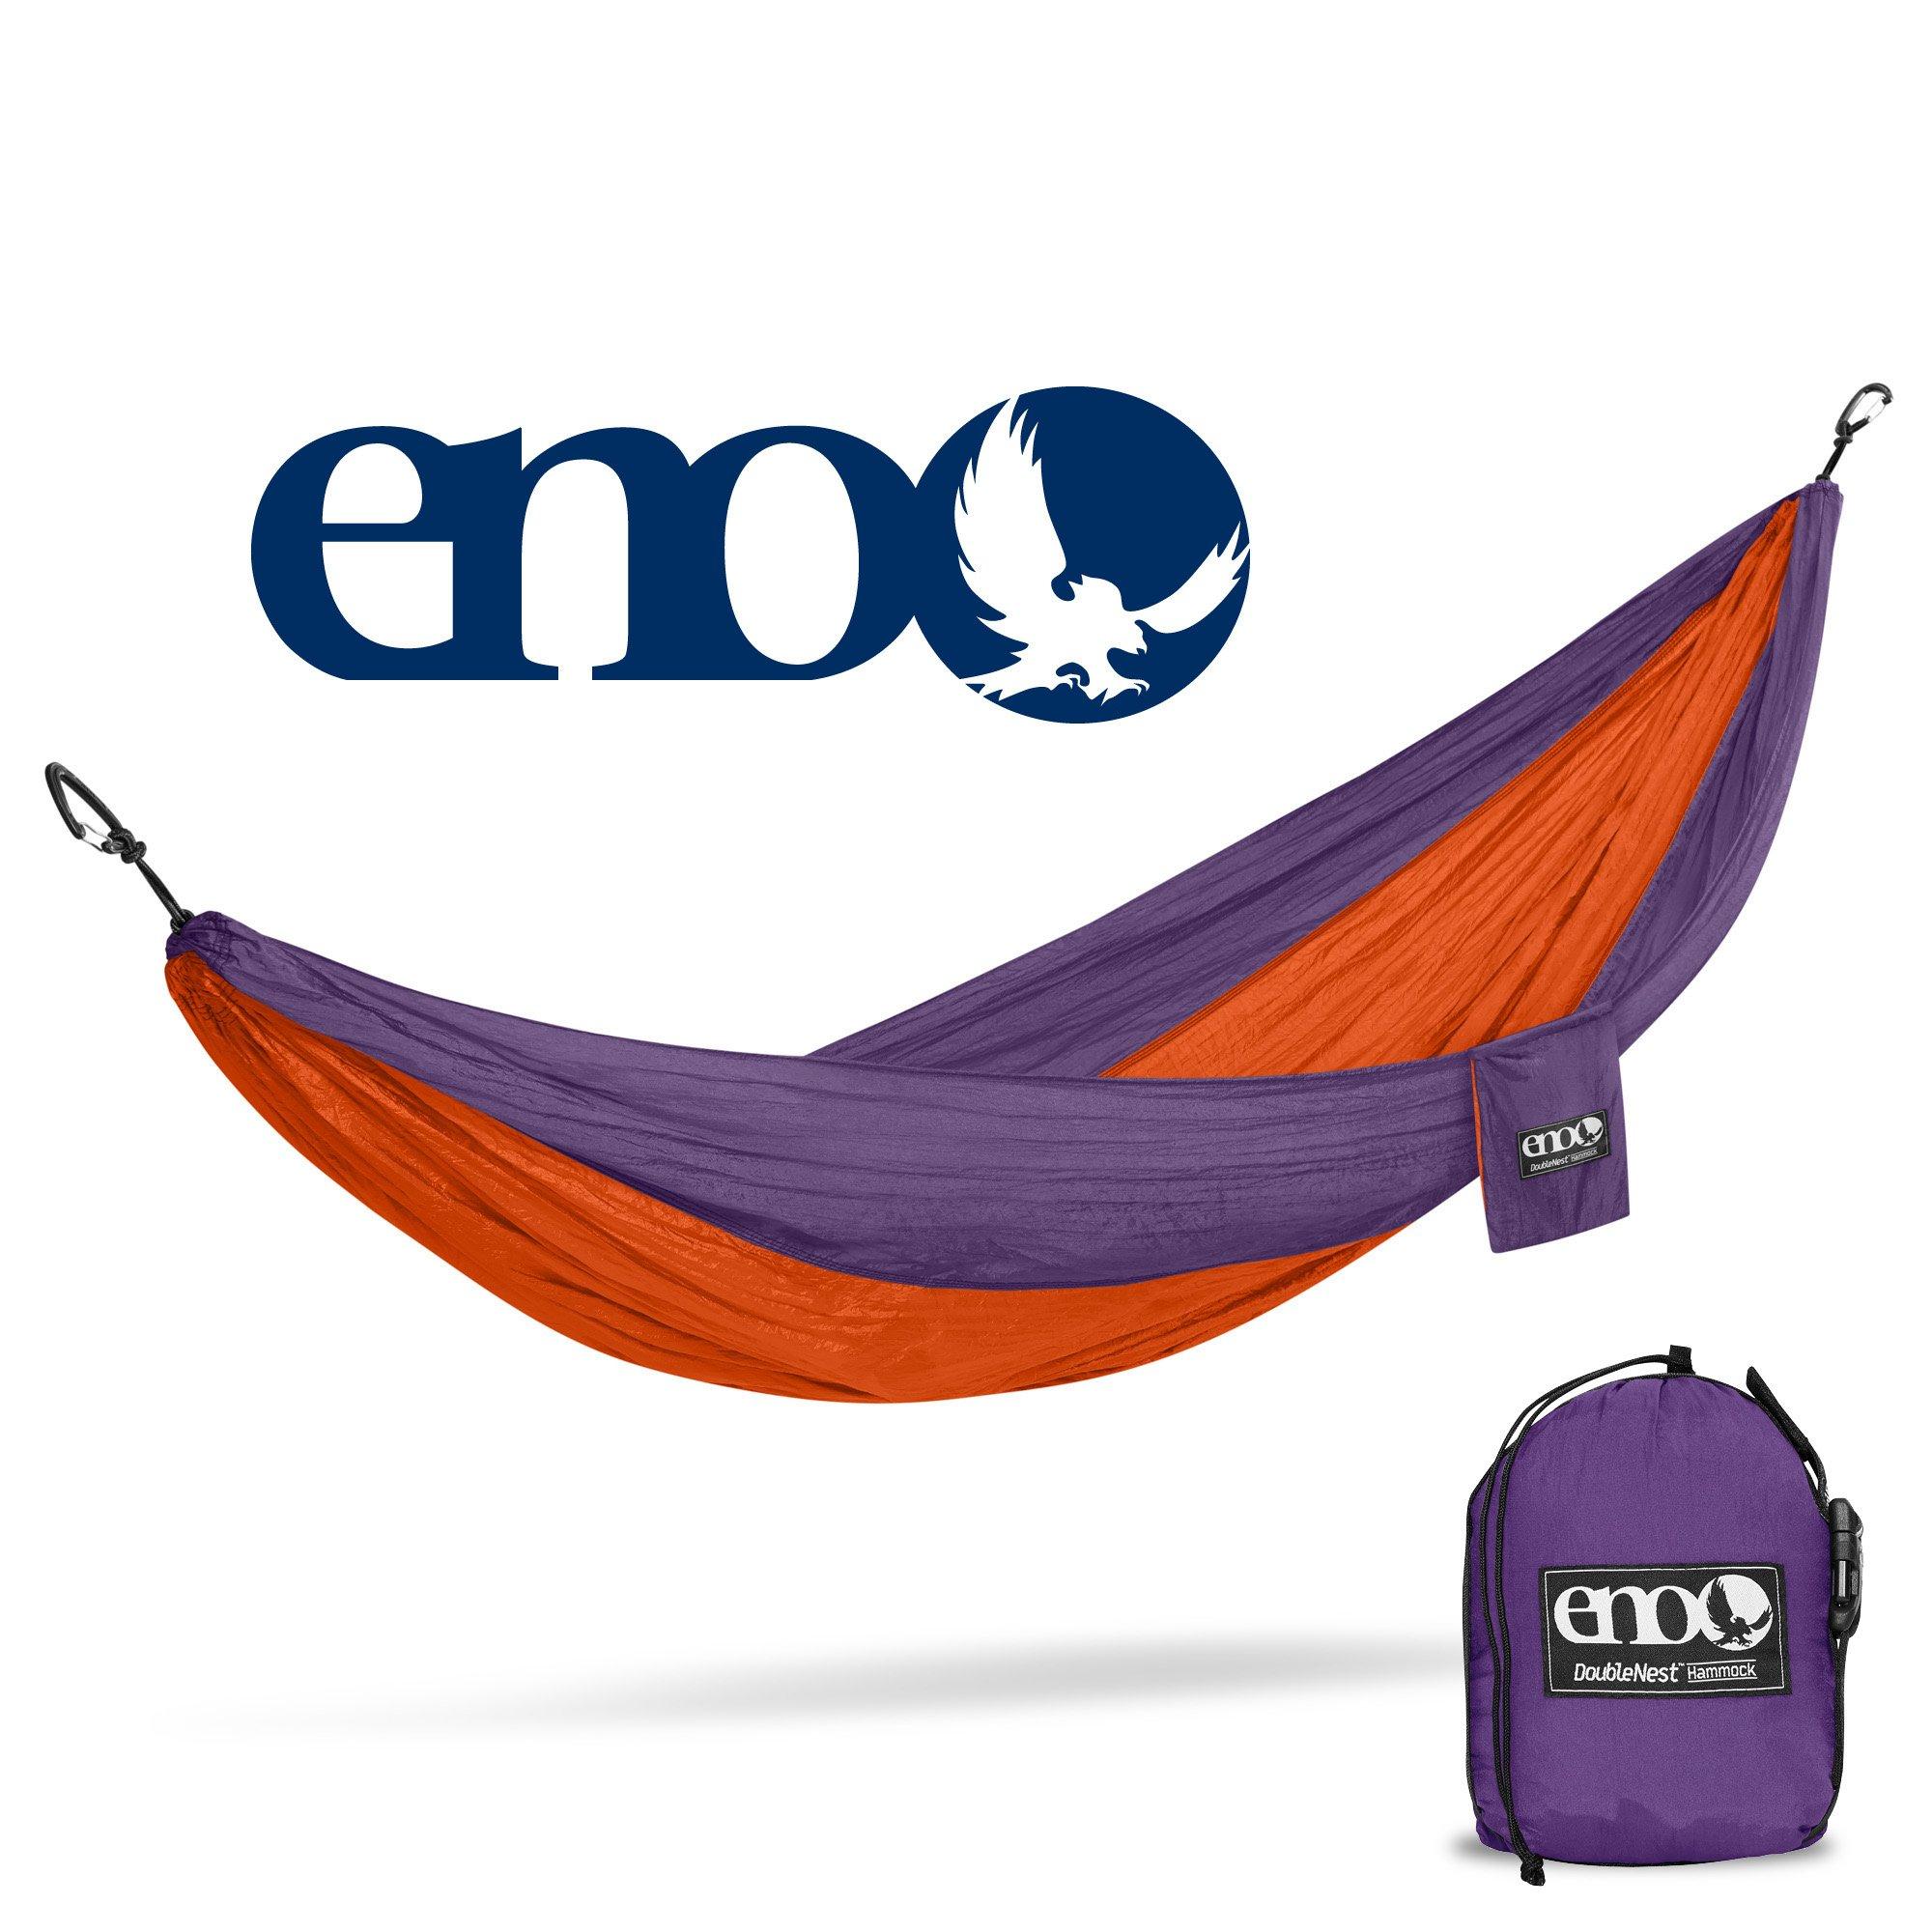 eno - Eagles Nest Outfitters DoubleNest Hammock, Portable Hammock for Two, Orange/Violet